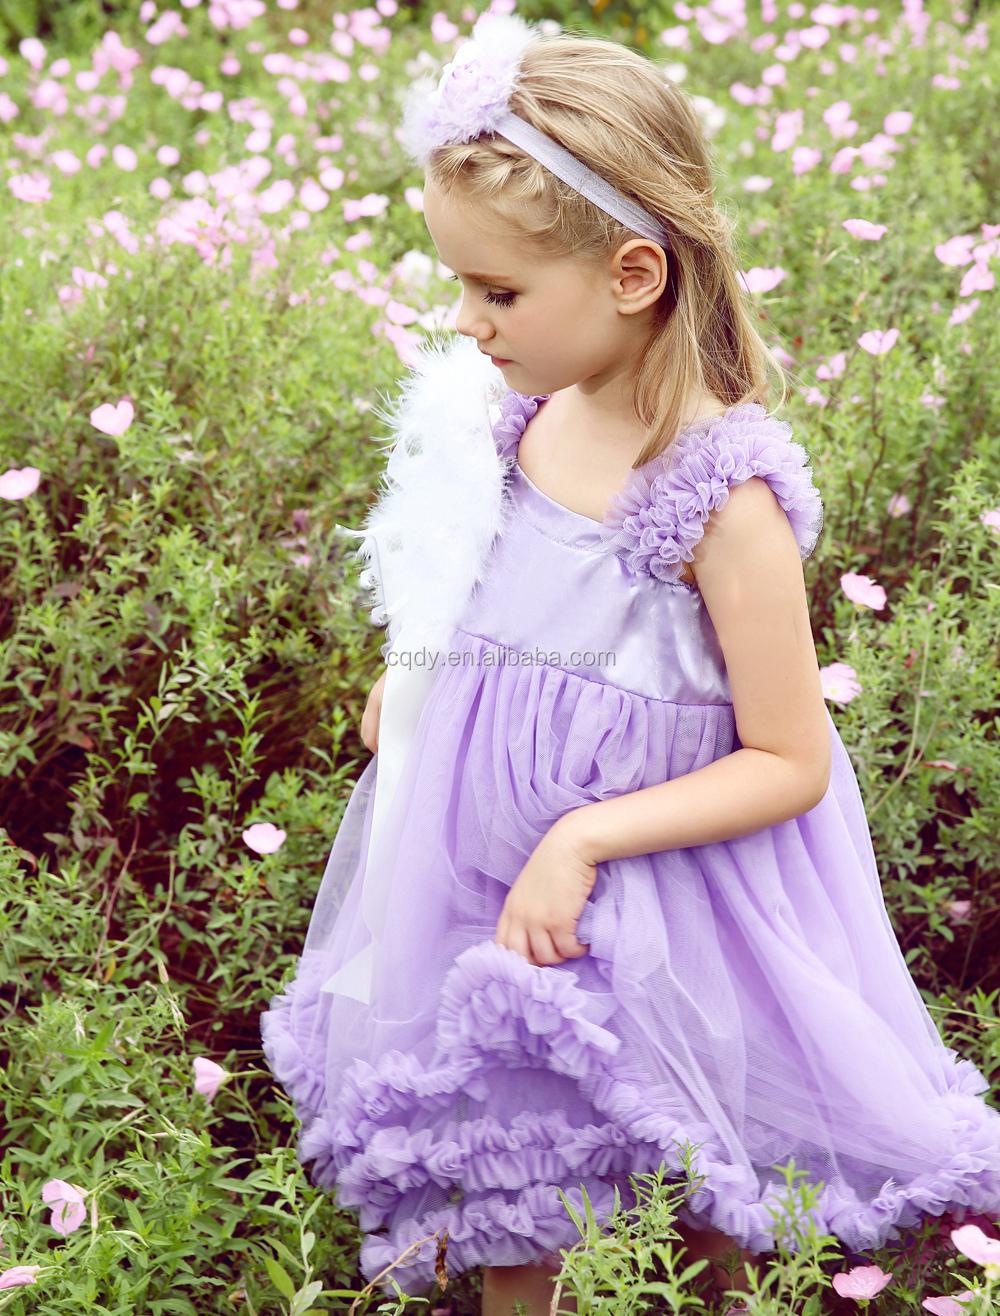 Luxury lilac feather princess flower girls dresses for beach jpg 84885e0d 5ef3 4132 8be1 2b16b5db6bd9 izmirmasajfo